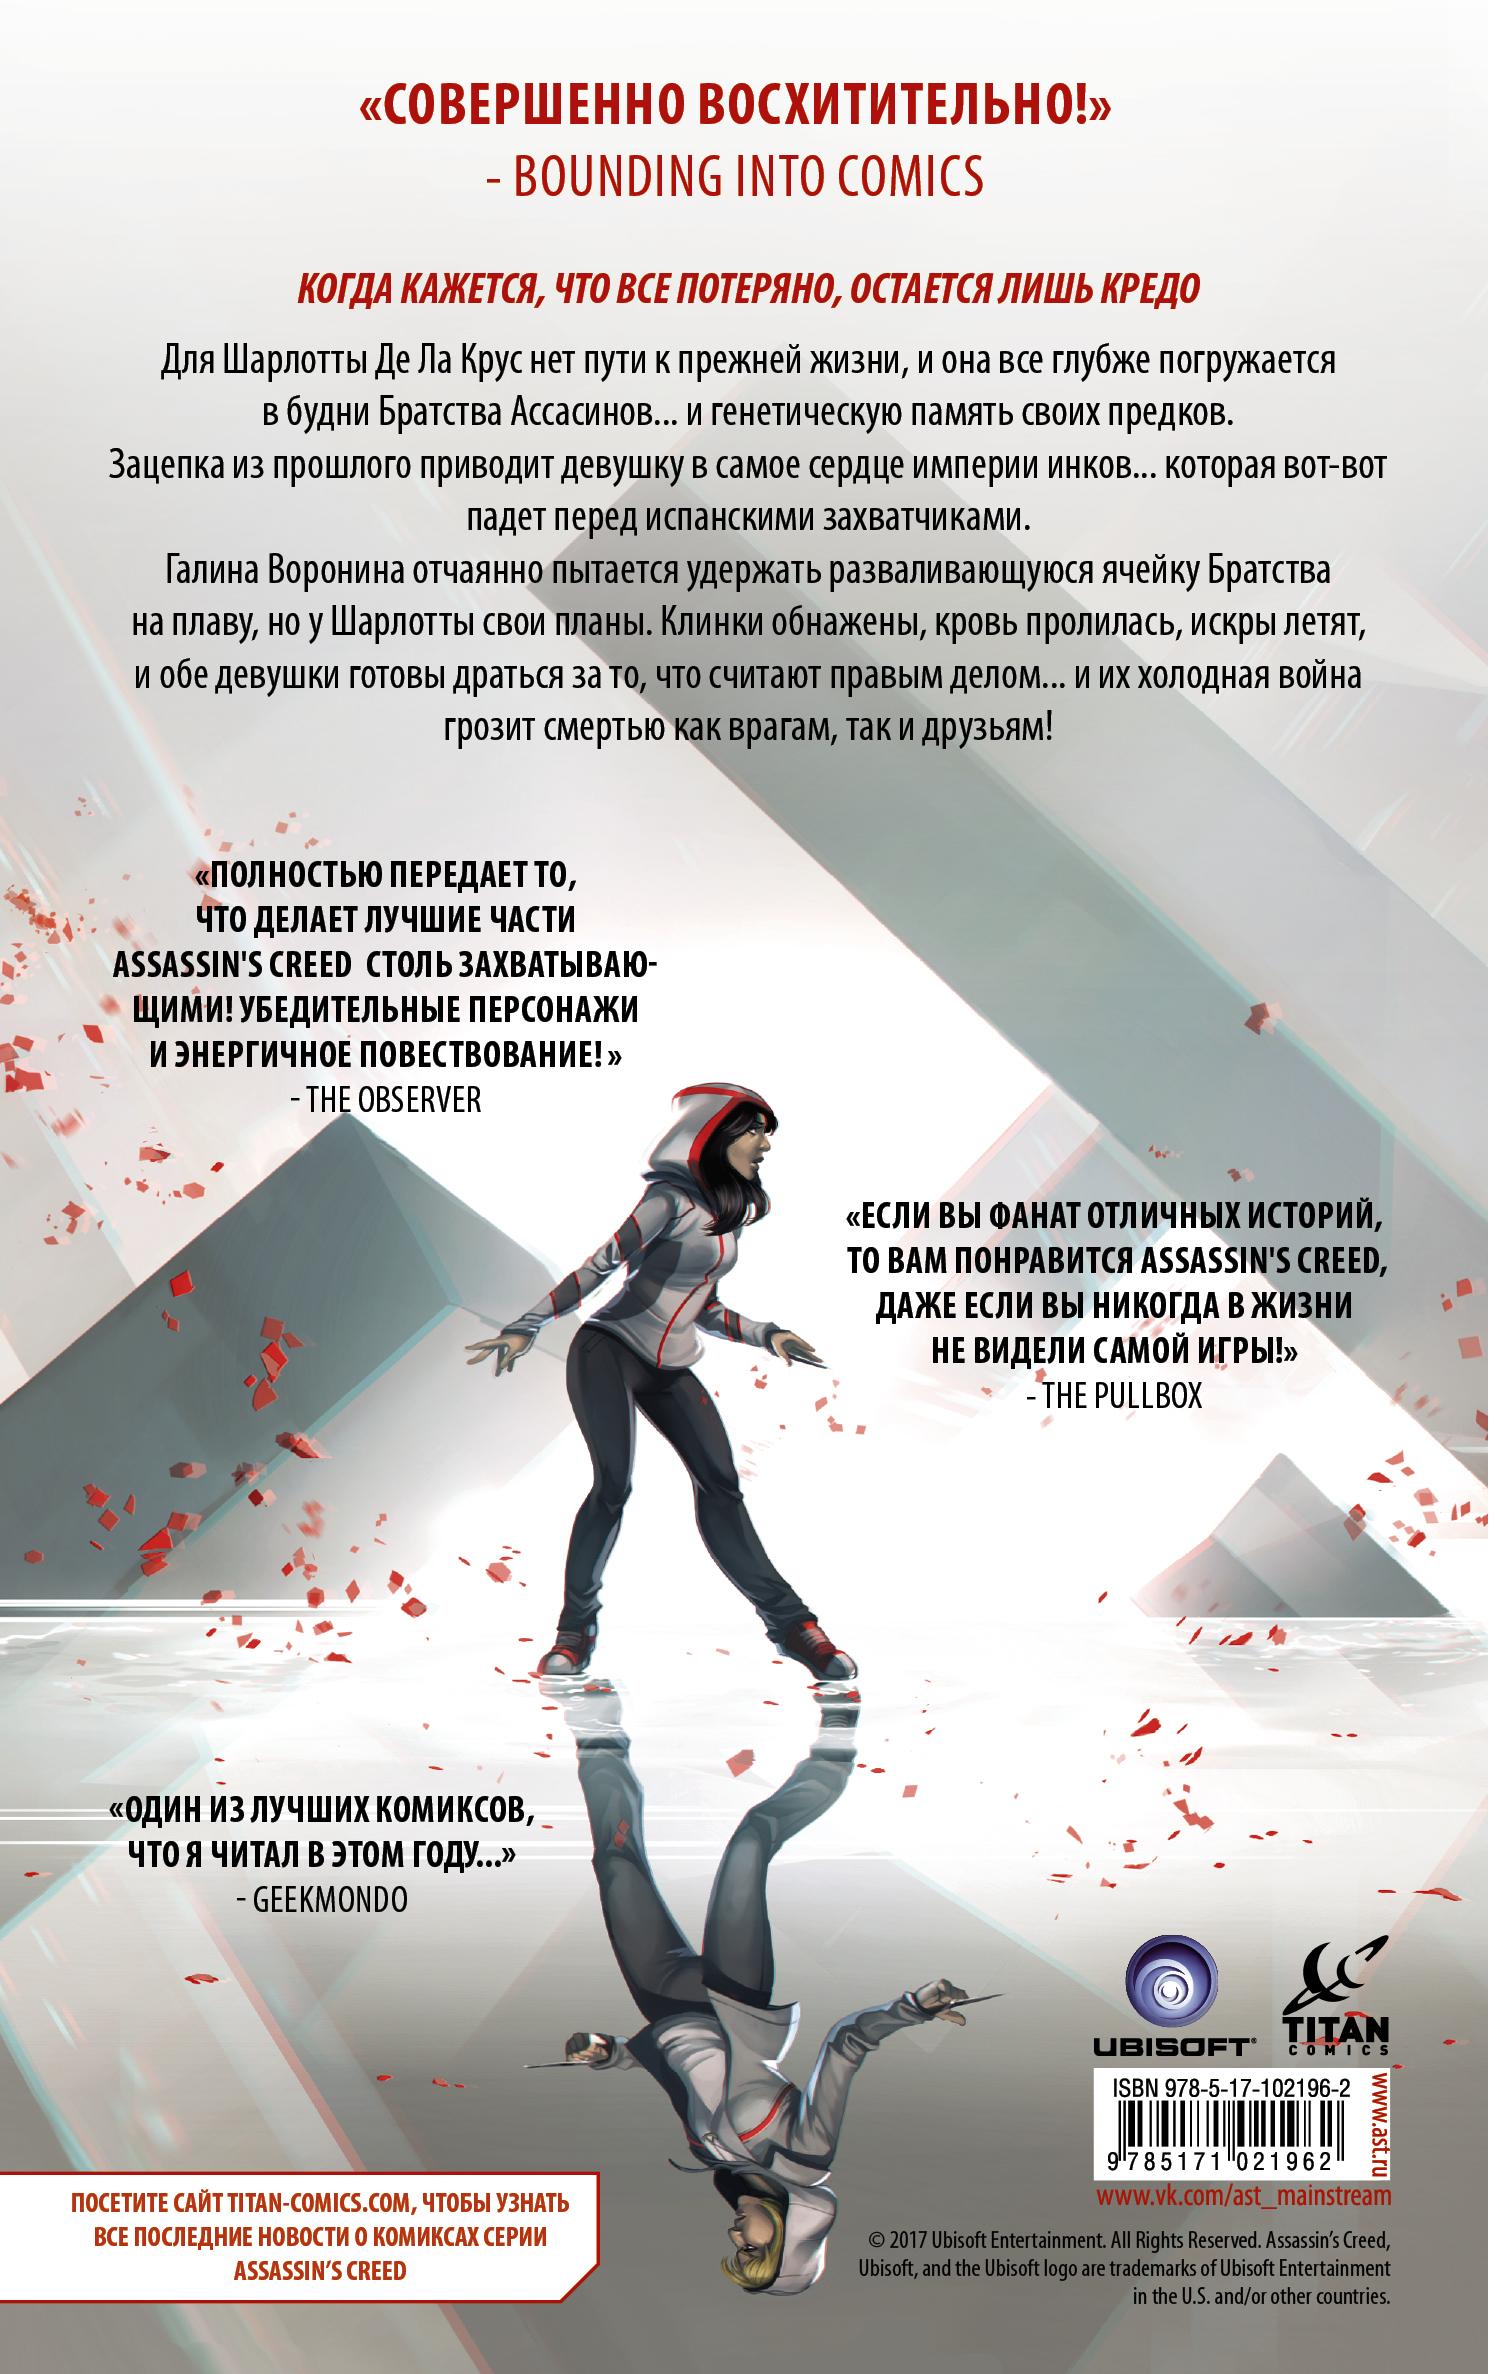 Энтони дель Кол, Конор МакКрири. Assassin's Creed. Закатное солнце 0x0